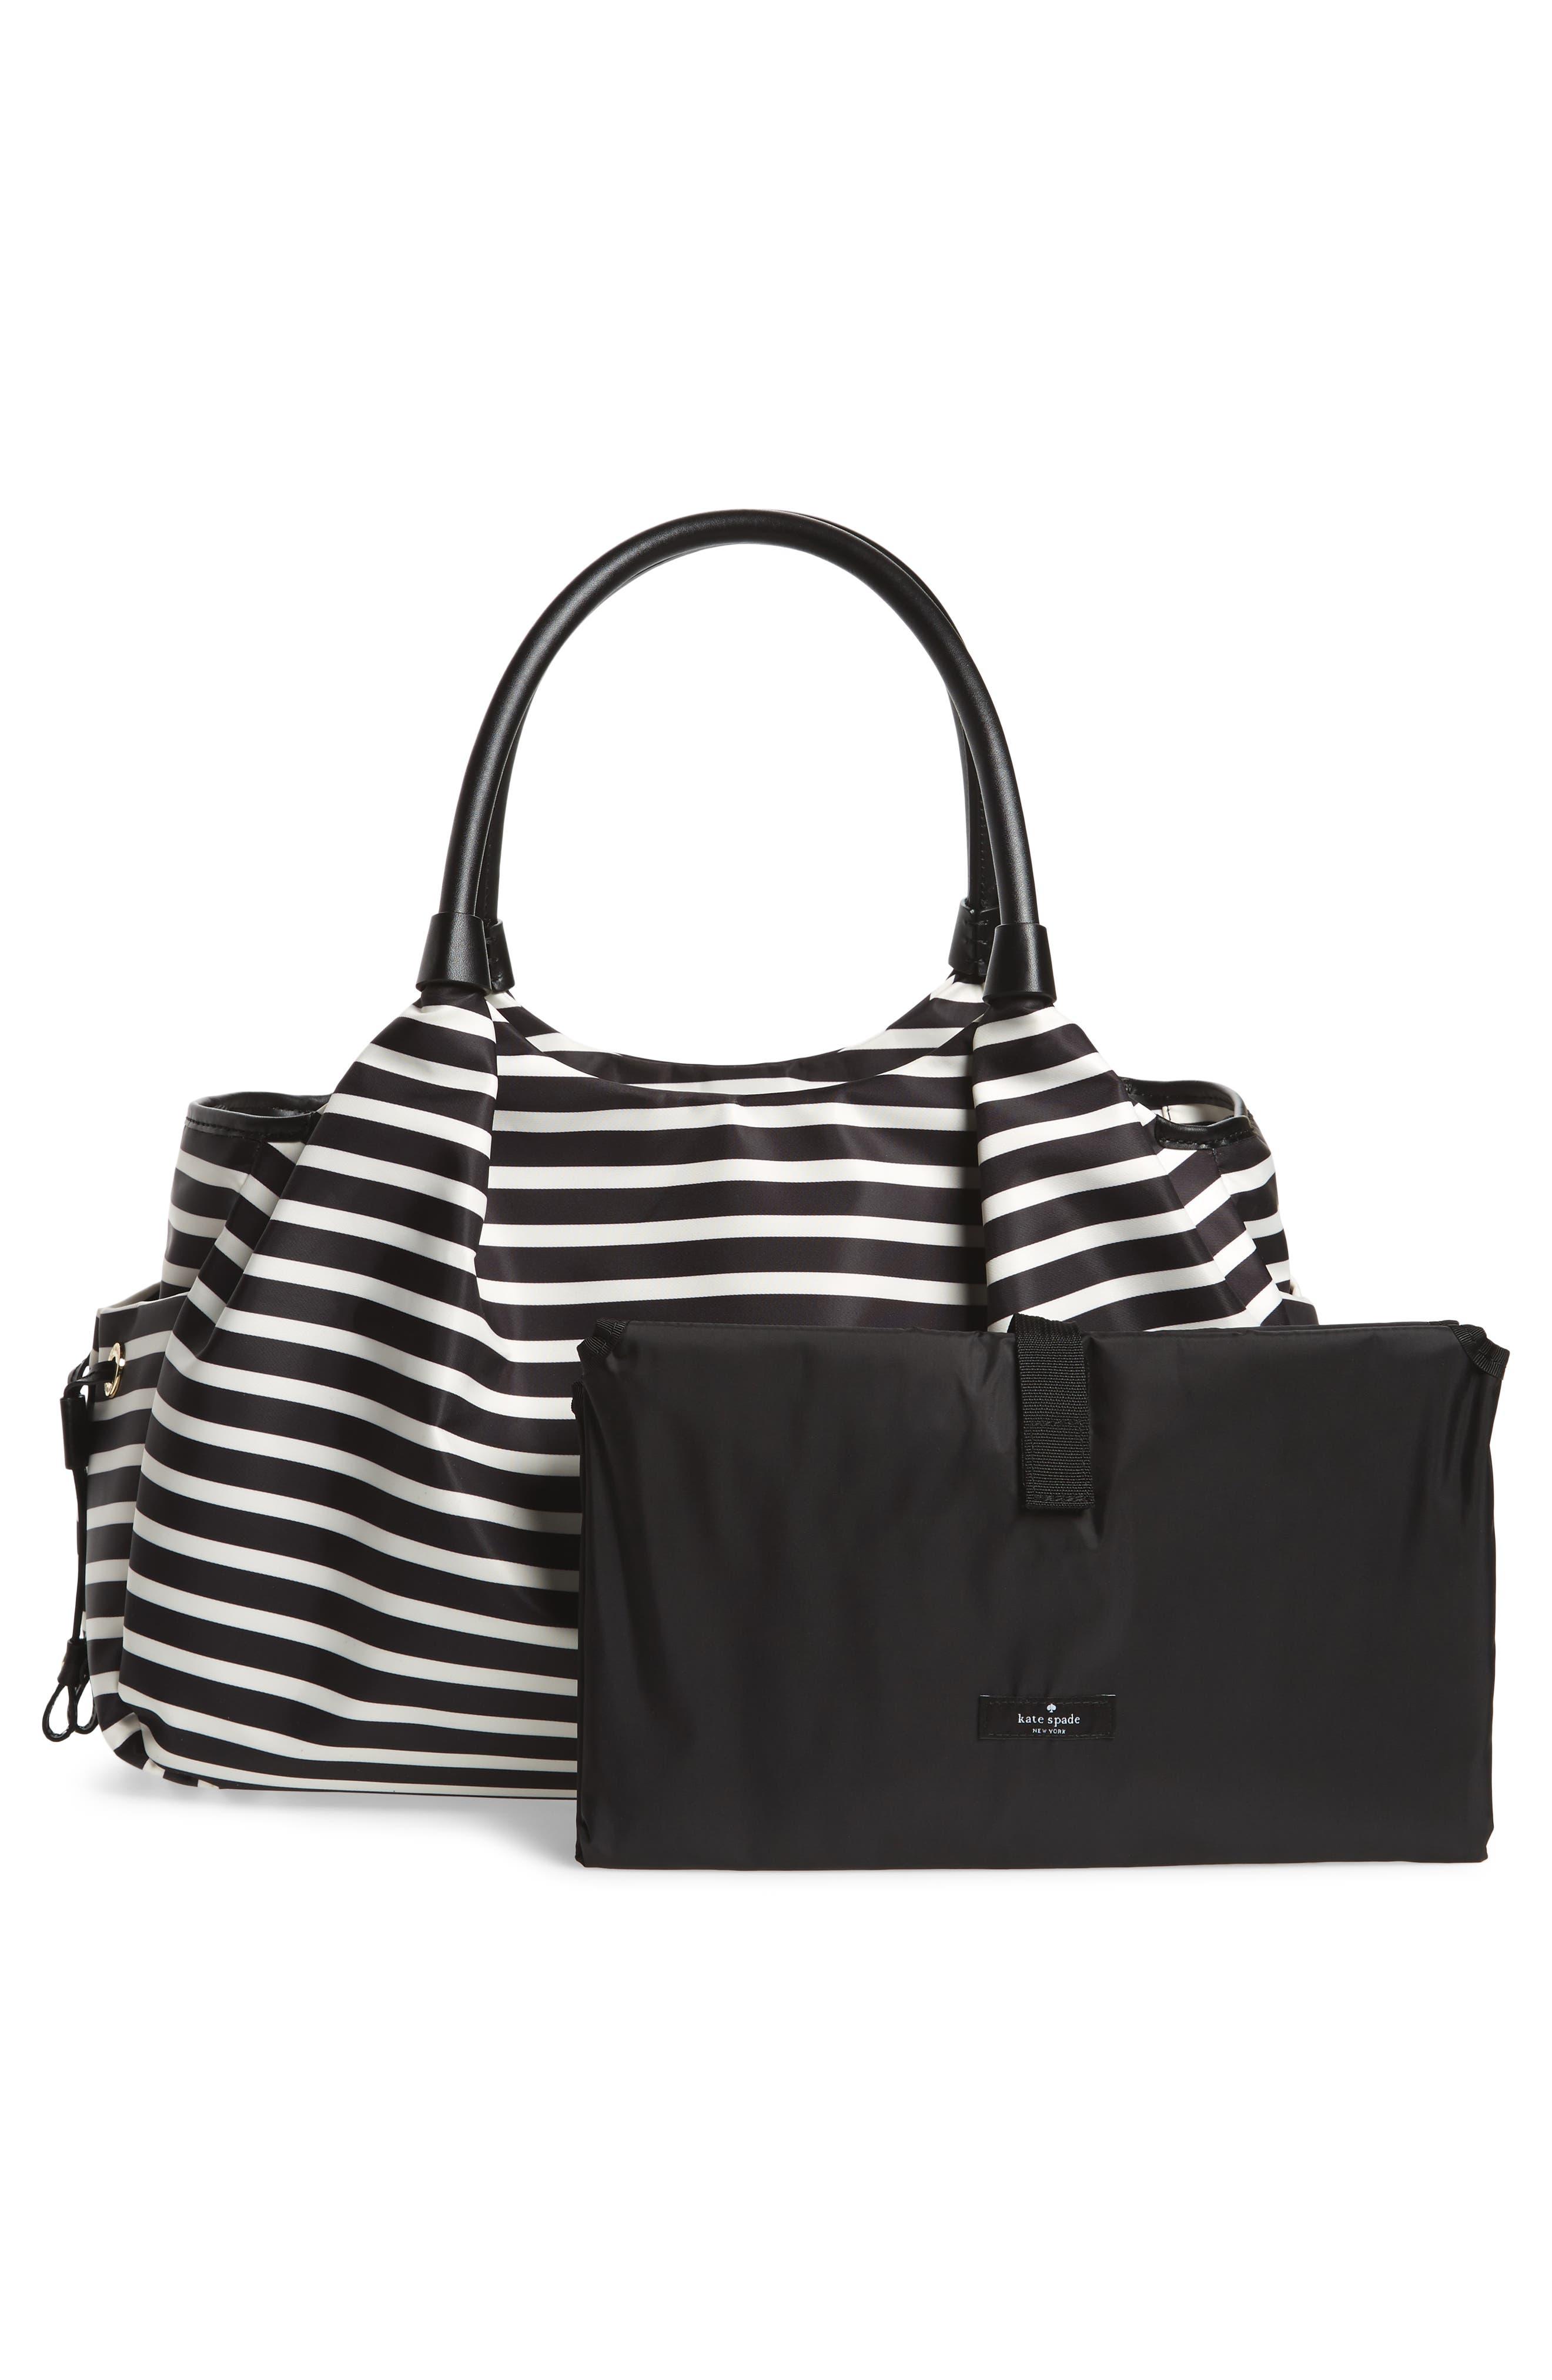 watson lane - stevie diaper bag,                             Alternate thumbnail 3, color,                             BLACK/ CLOTTED CREAM